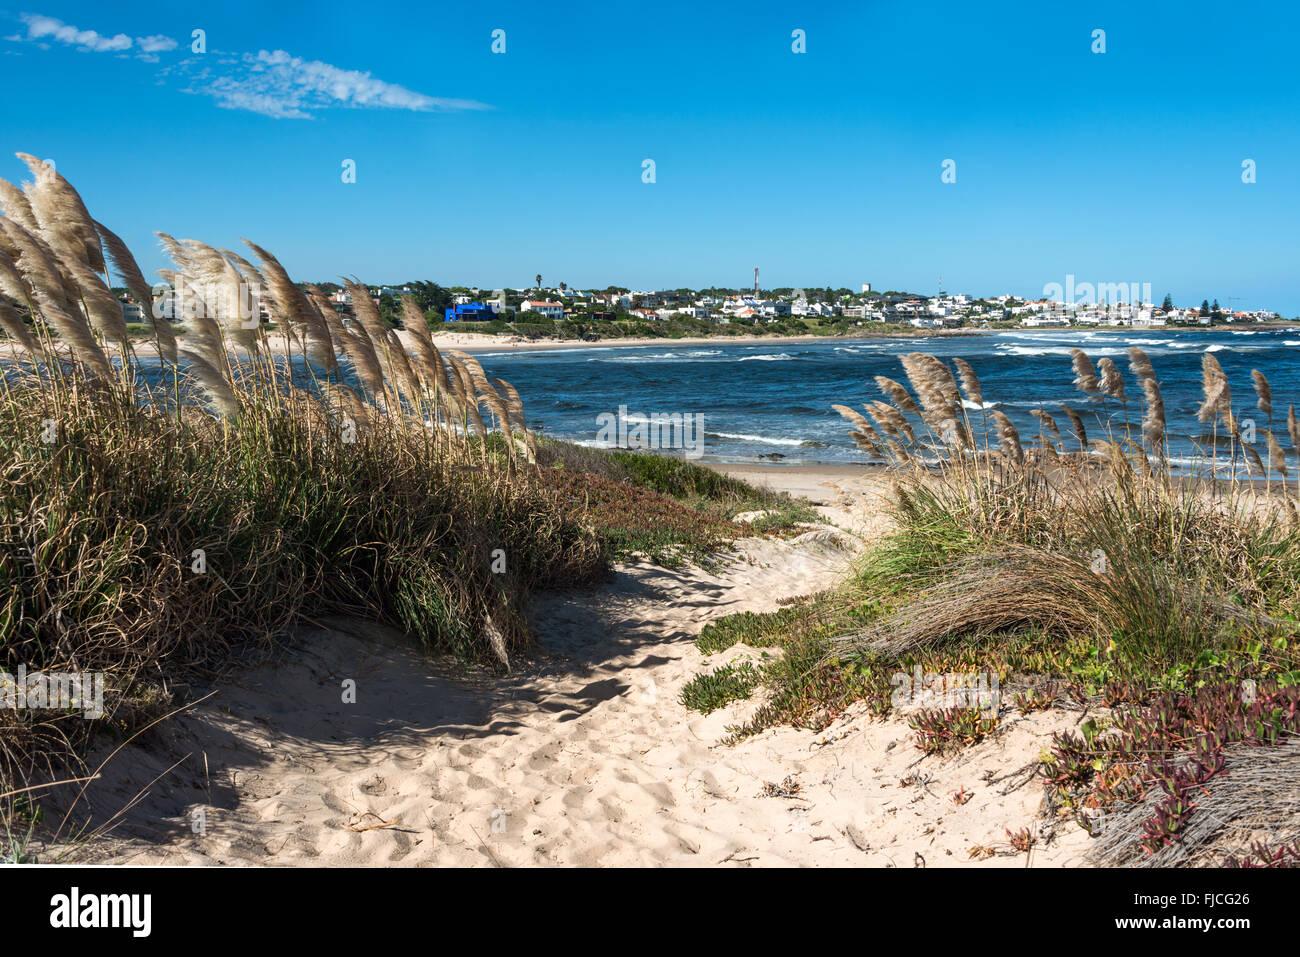 Beach in La Barra, a picturesque famous popular seaside holiday destination in Punta del Este, Uruguay - Stock Image